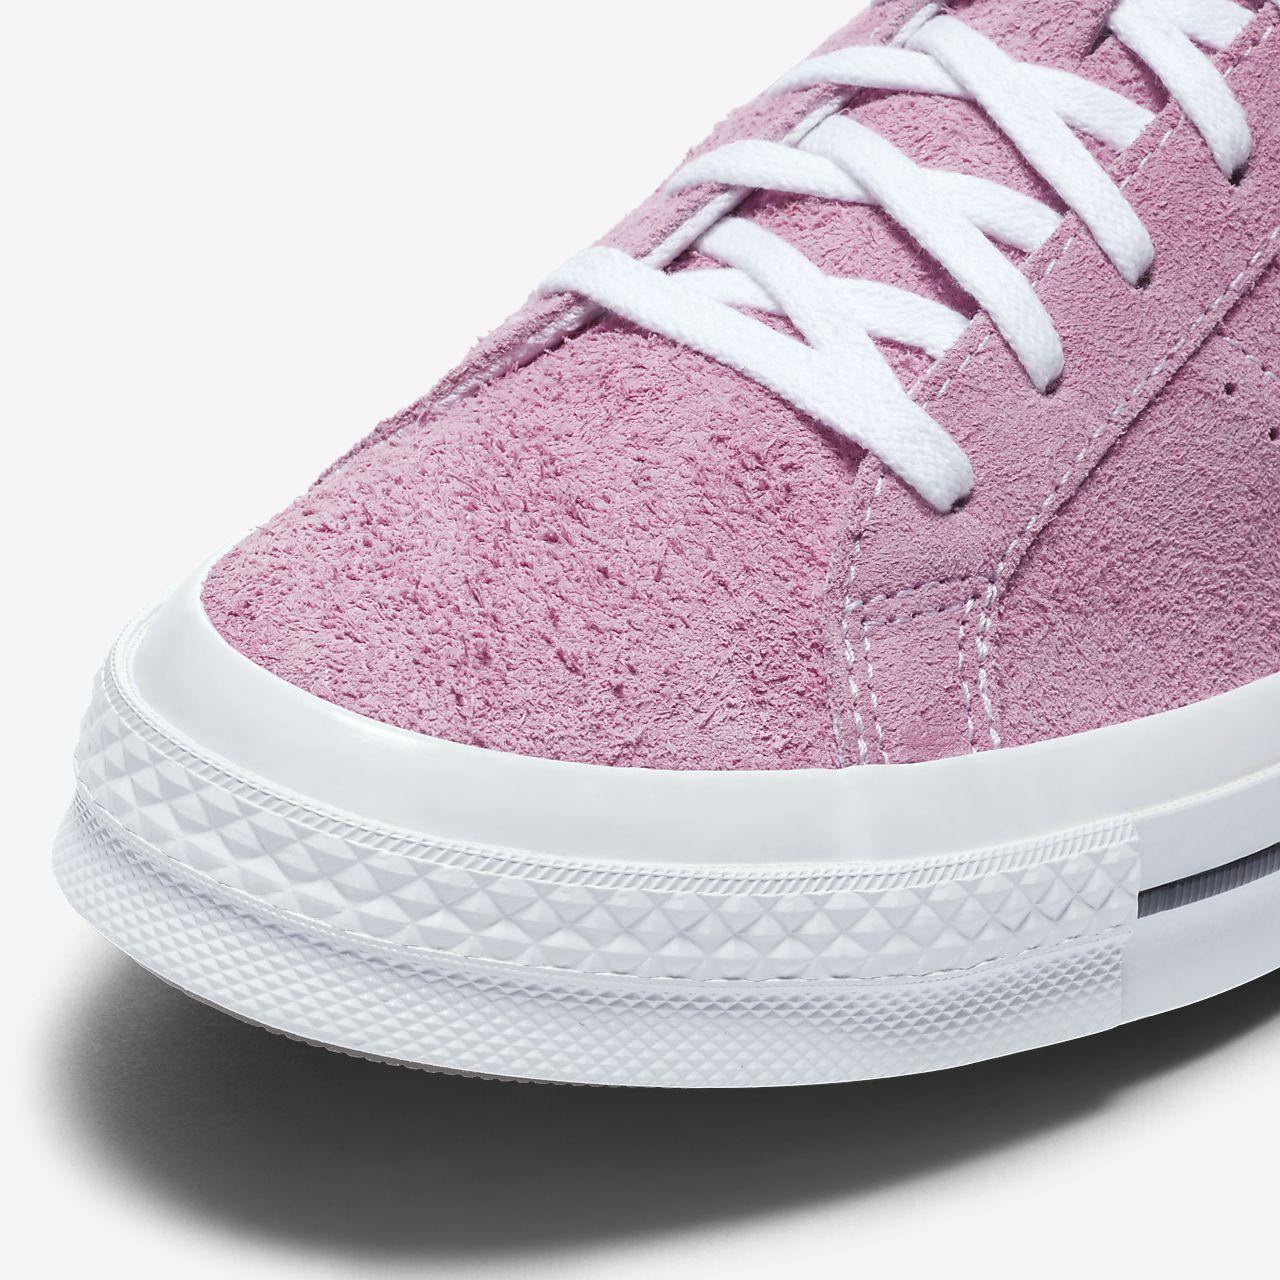 ... Converse One Star Premium Suede Low Top Men's Shoe